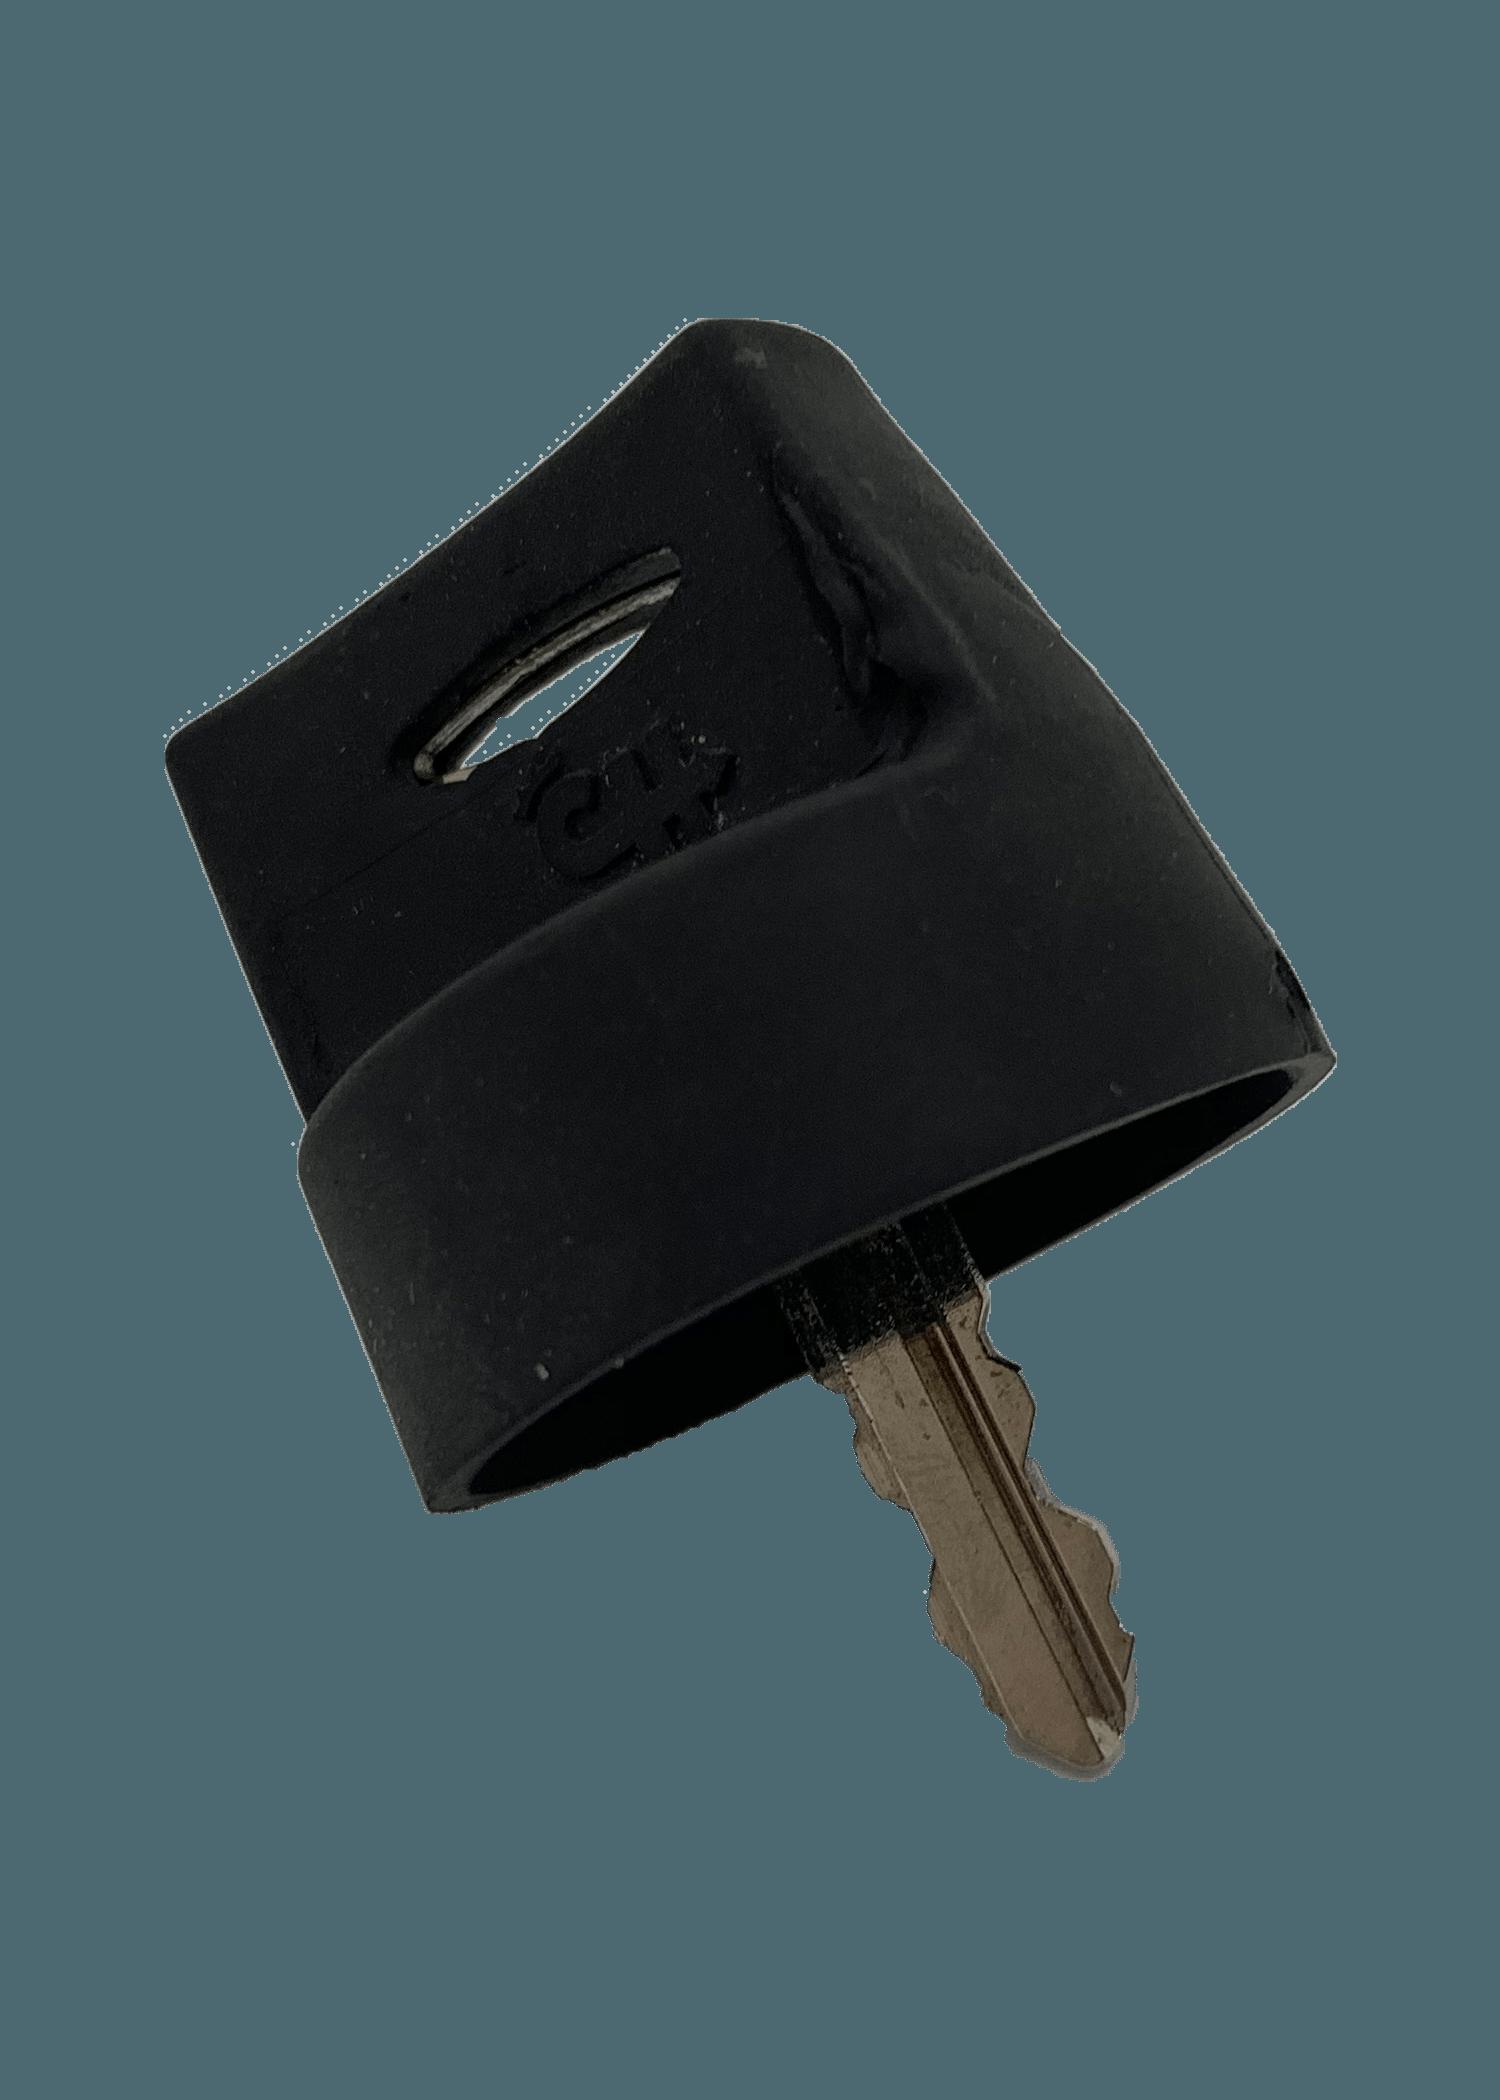 Multiquip Trowel Key